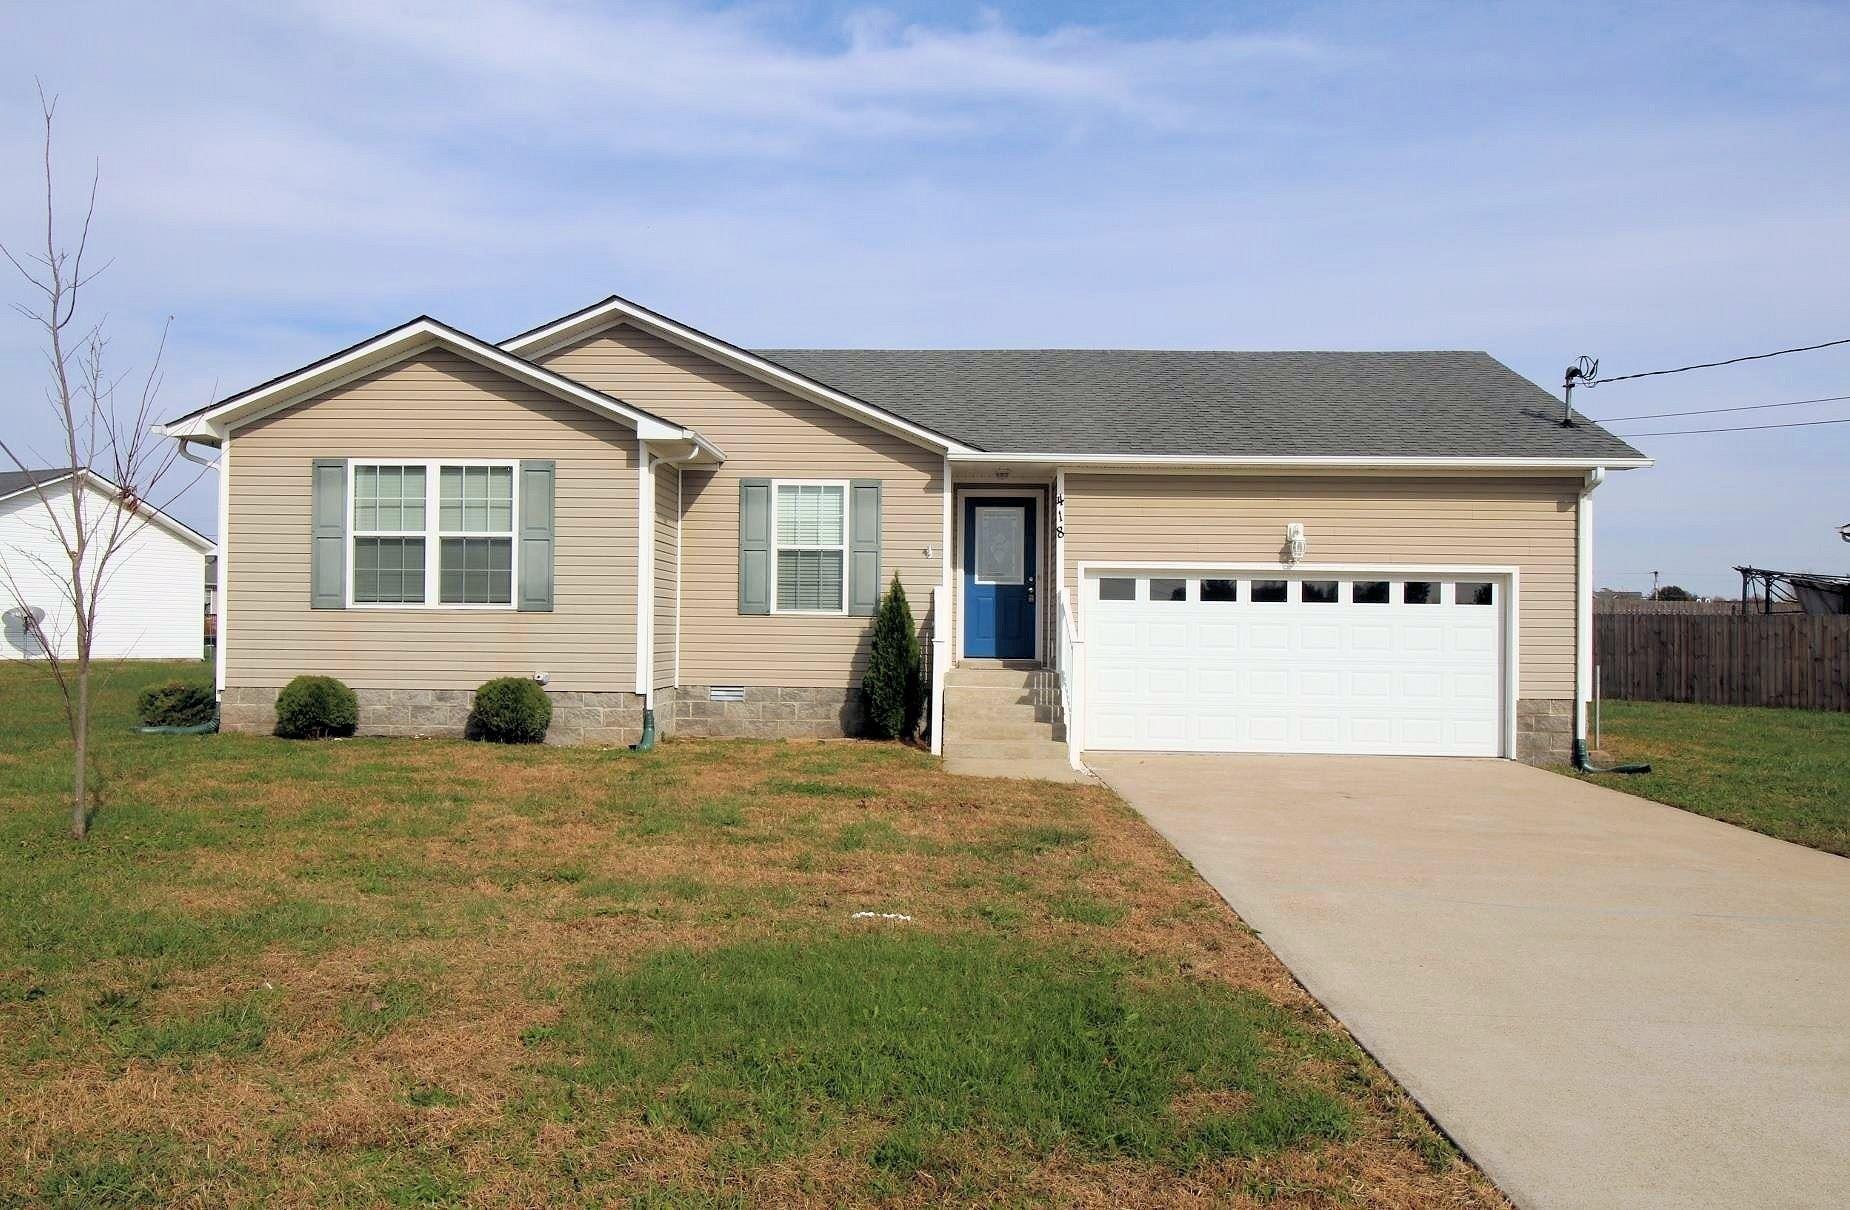 418 FILMORE RD, Oak Grove, KY 42262 - MLS#: 2293400